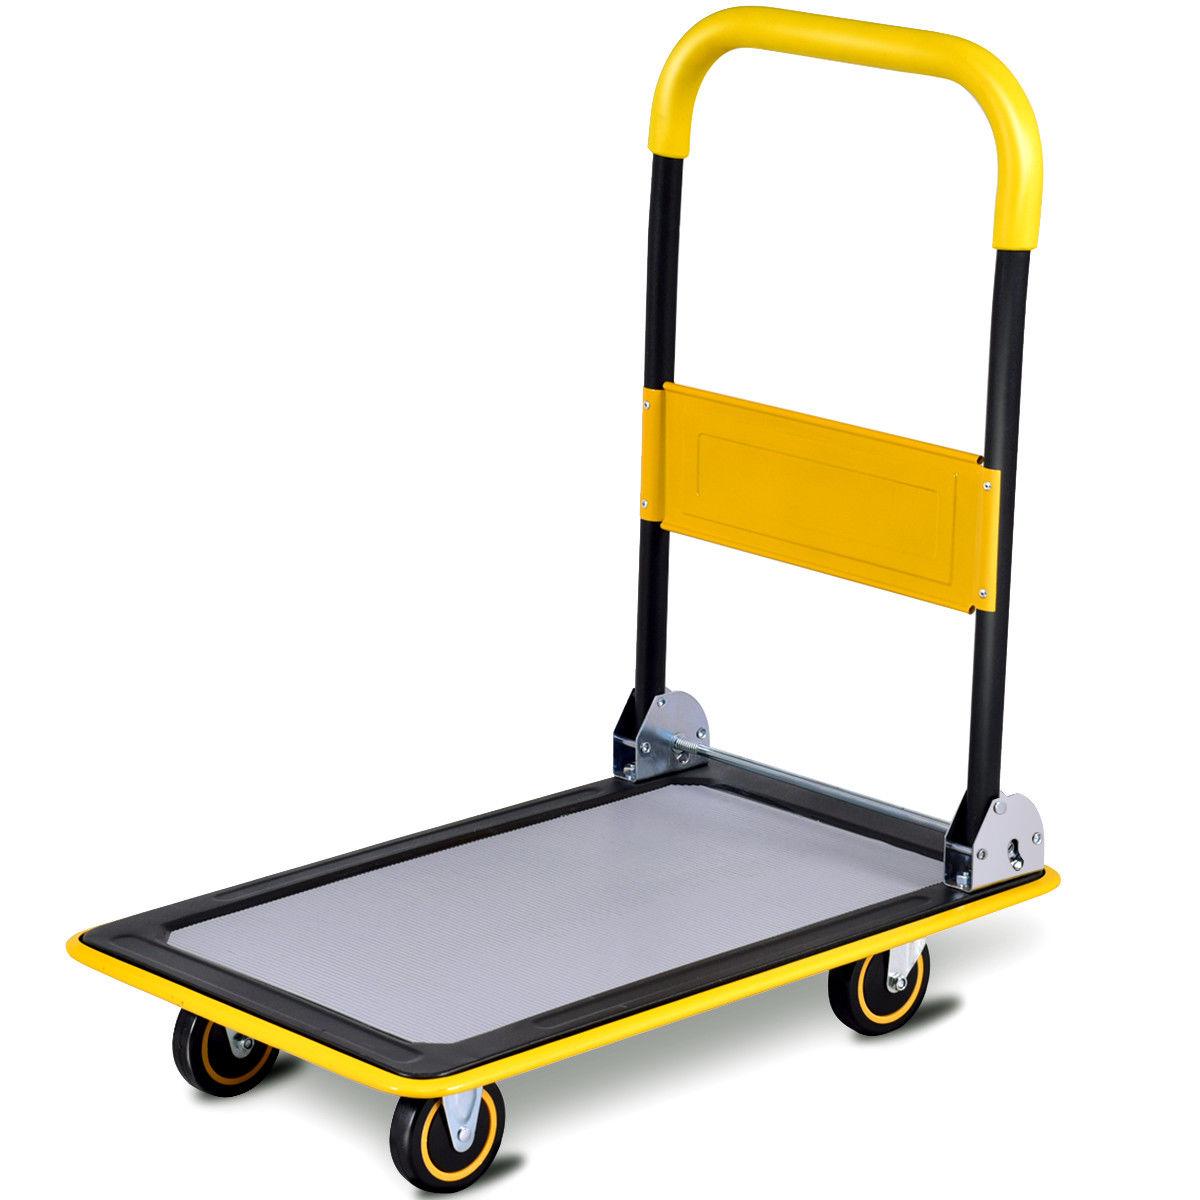 Costway 330lbs Folding Platform Cart Dolly Push Hand Truck Moving Warehouse Foldable